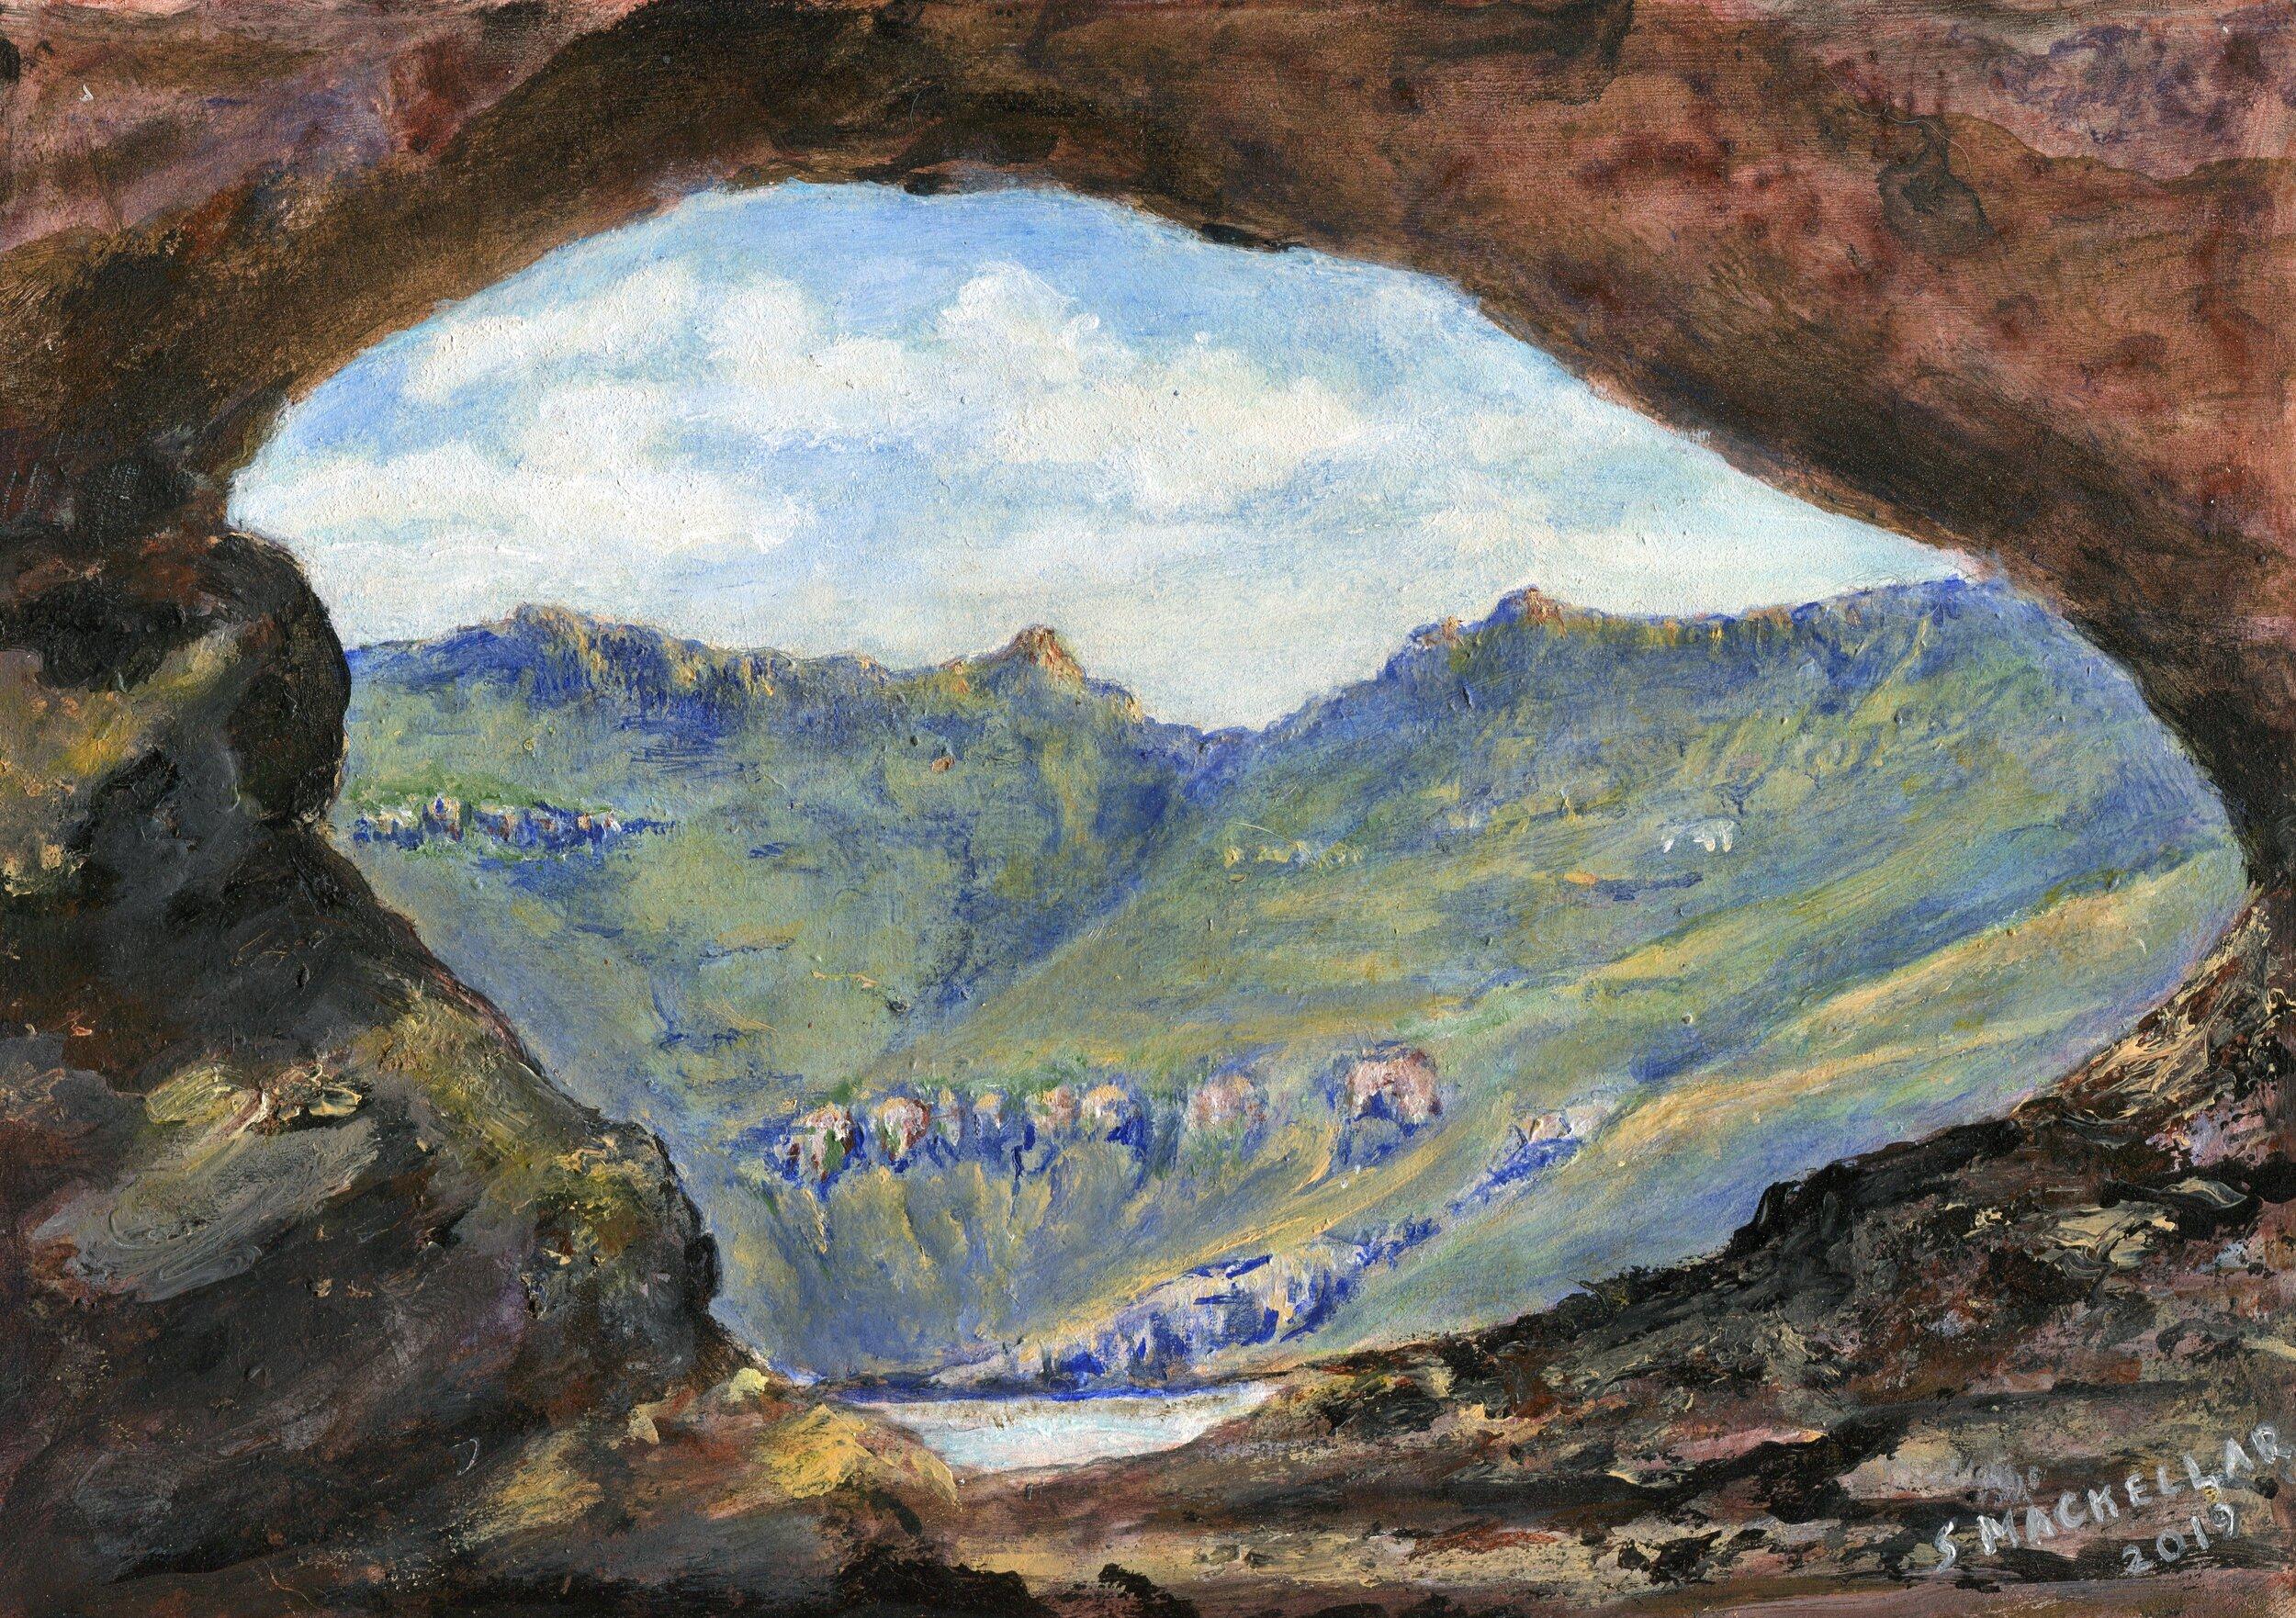 48a  Shirley Mackellar  Hodgesons Peak Drakensberg  acrylic on board